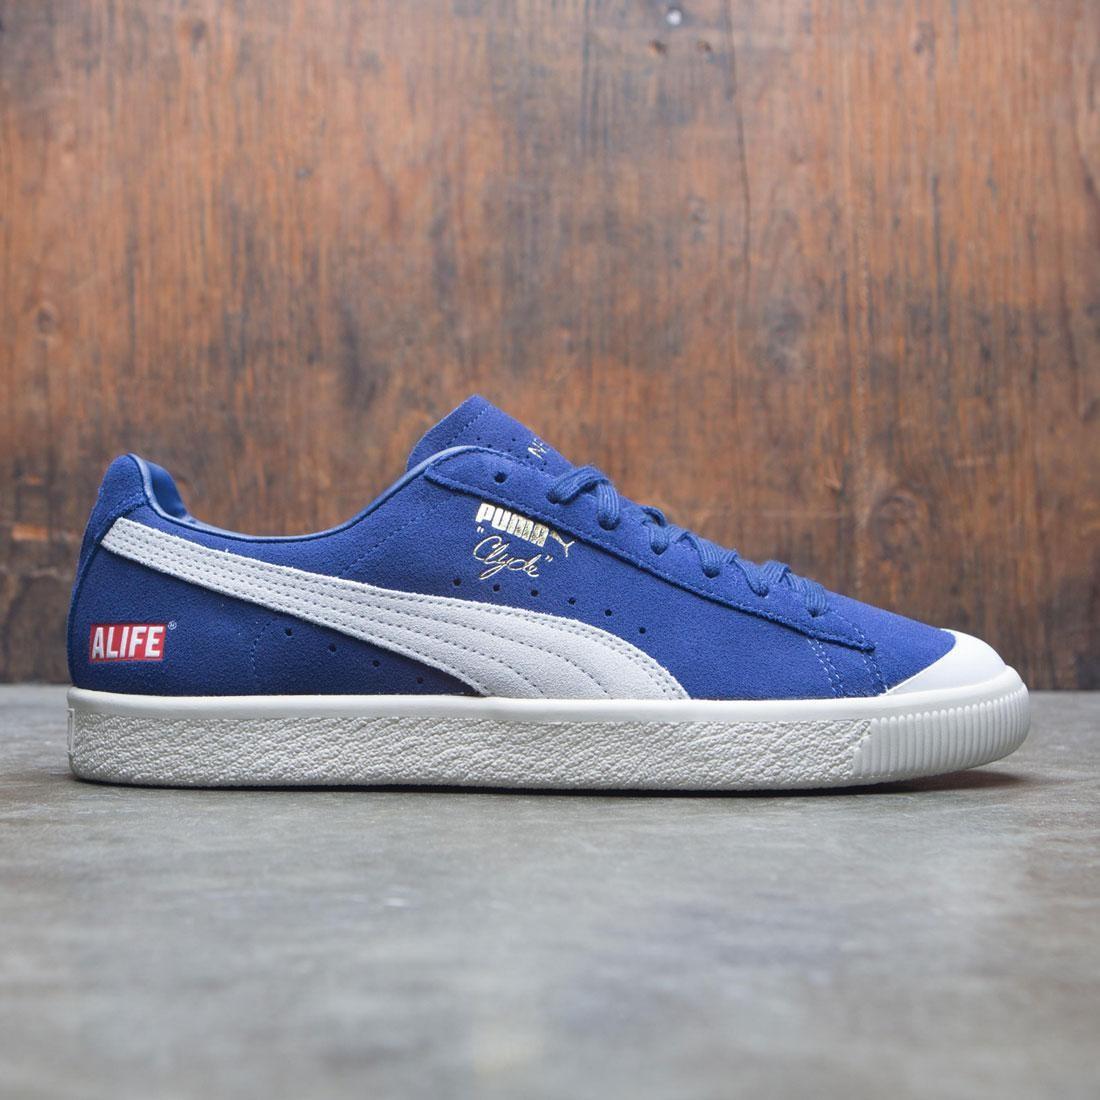 Puma x ALIFE Men Clyde RT blue white